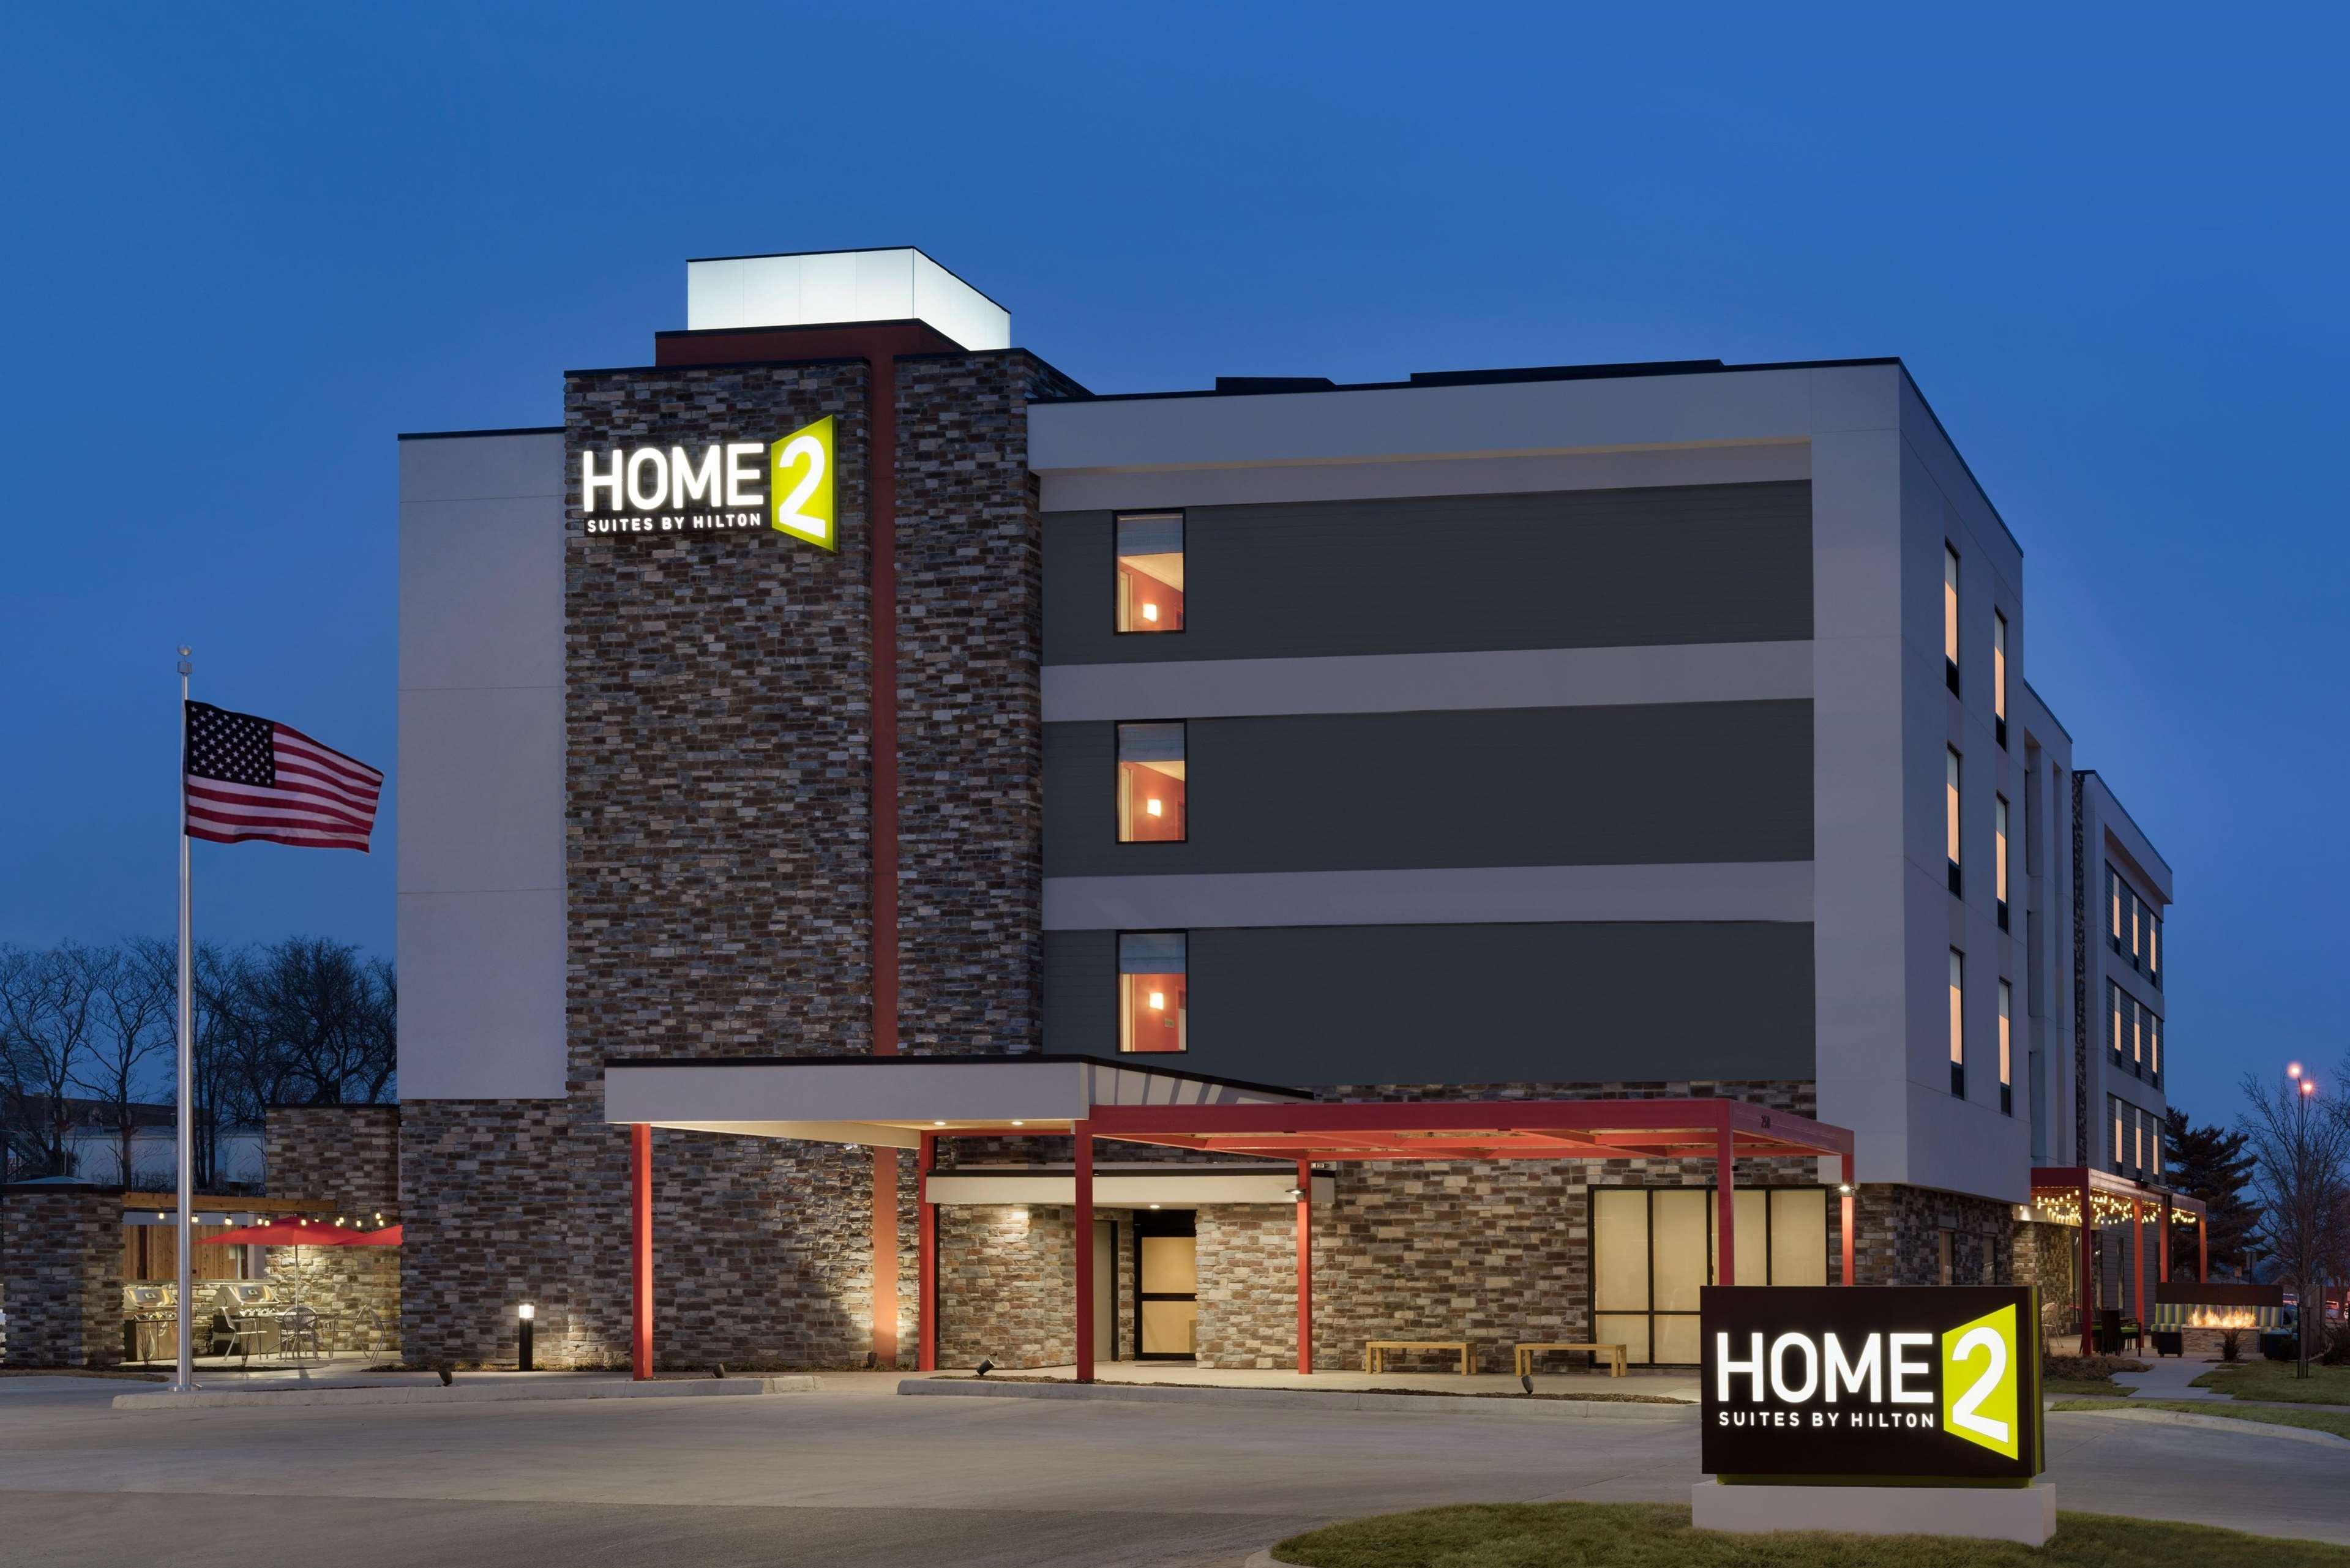 Home2 Suites by Hilton Leavenworth Downtown image 0